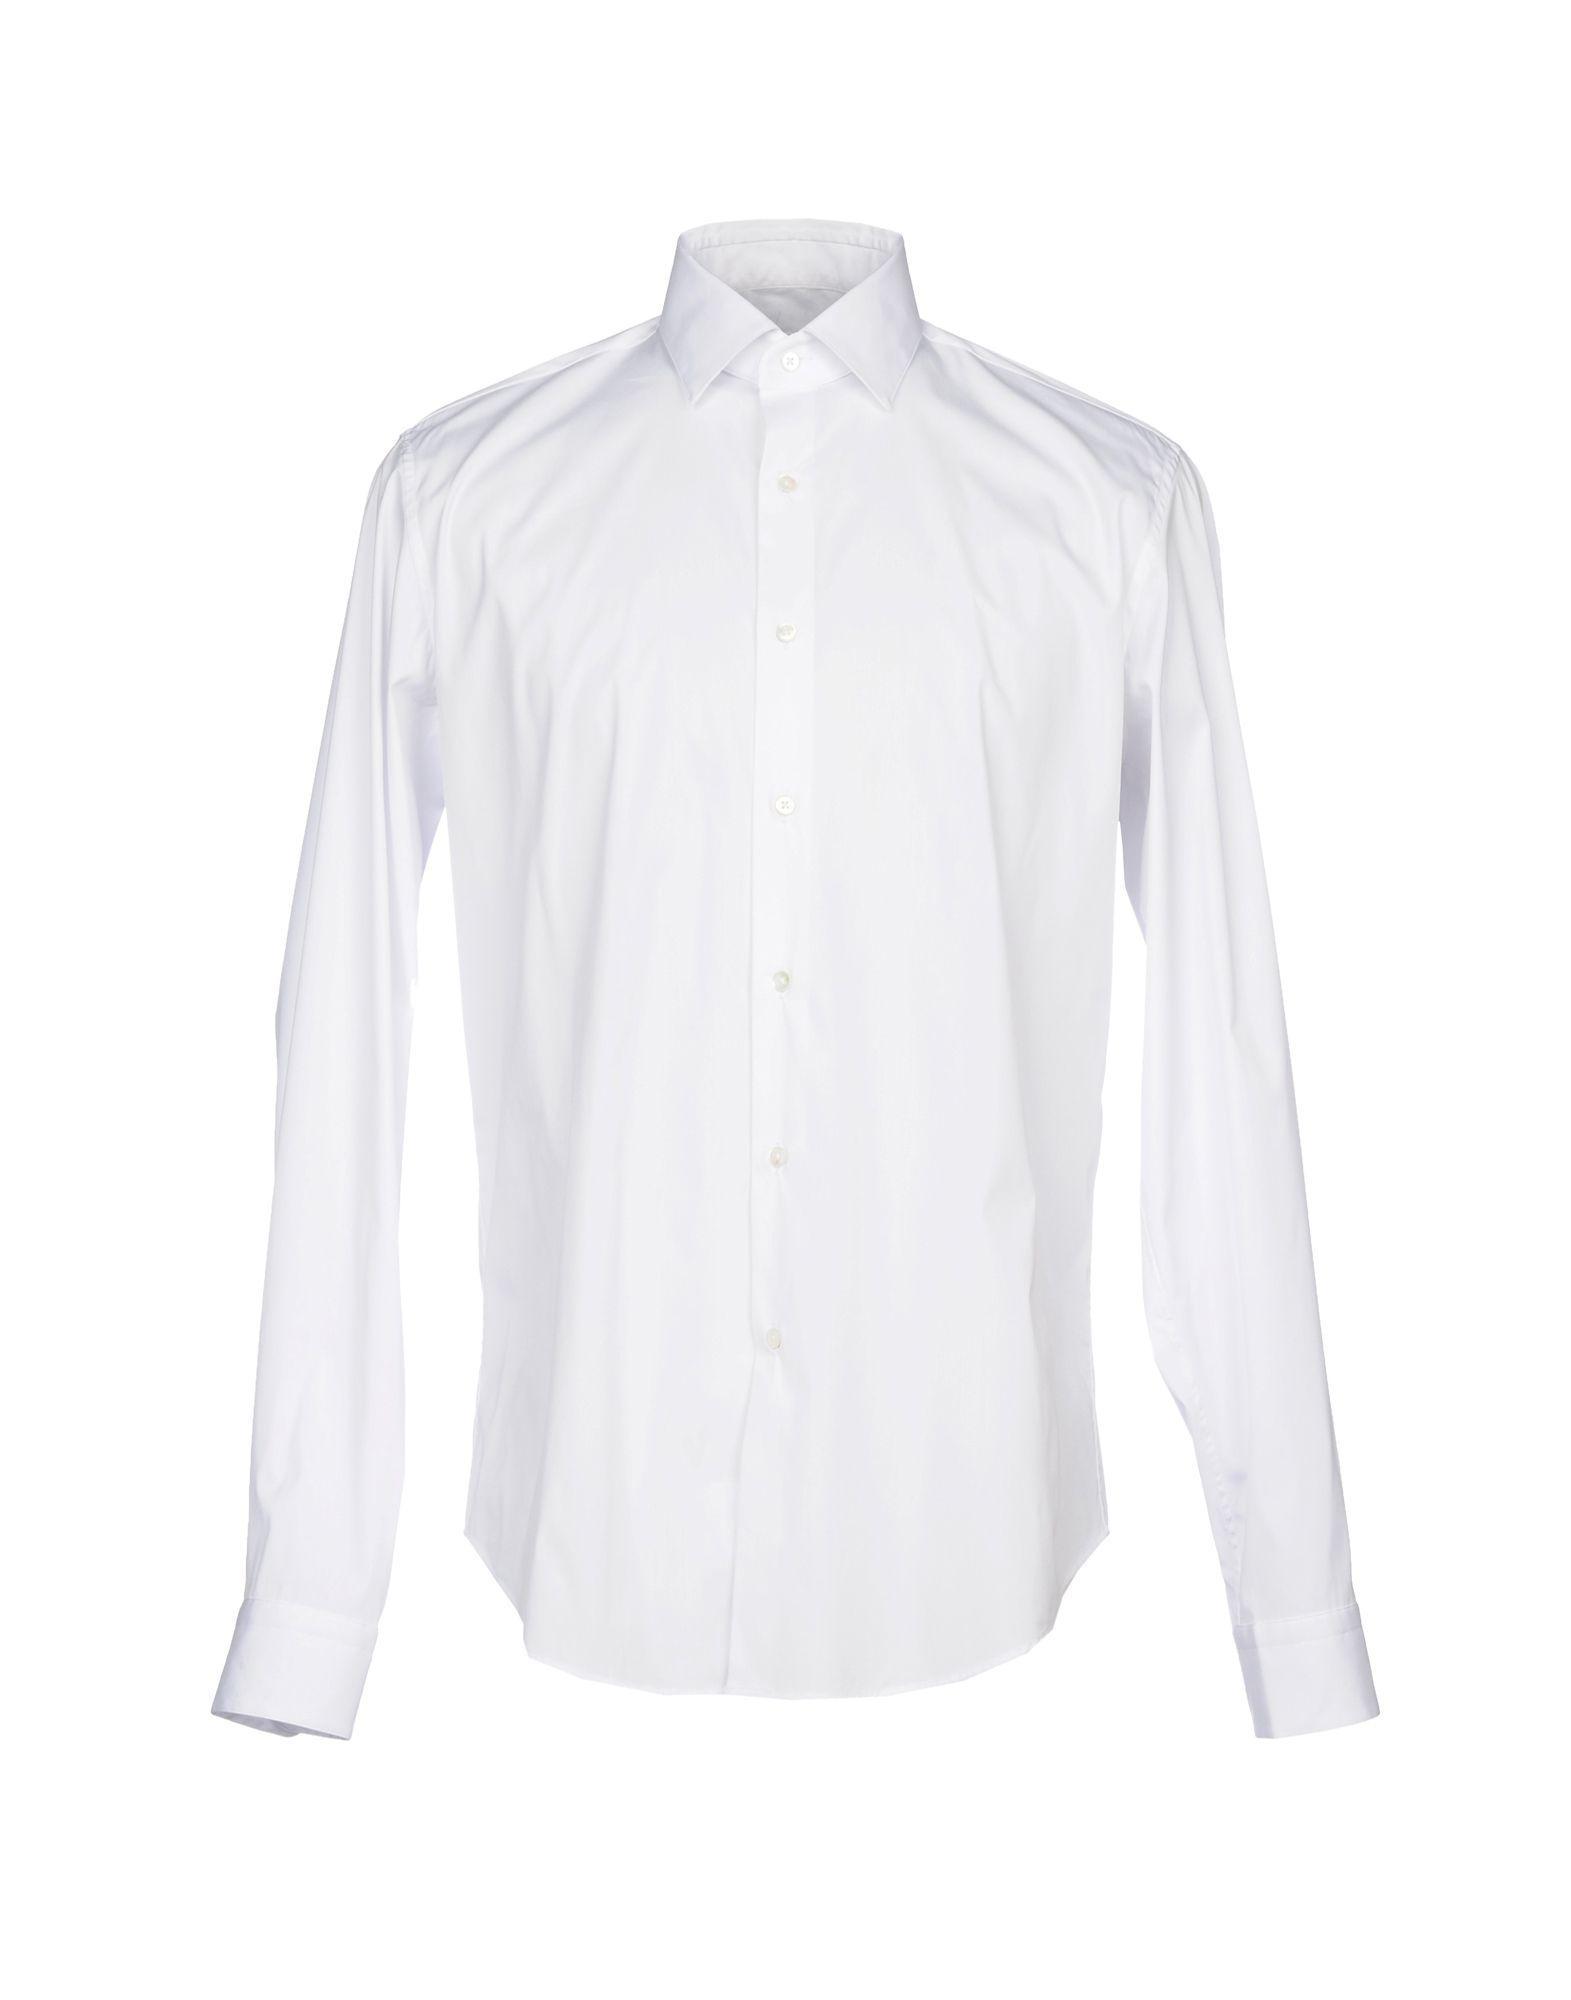 SHIRTS - Shirts Matthew Goodman Cheap Sale Discounts Cheap Sale Authentic 2018 Newest Online FuXfEq44NX